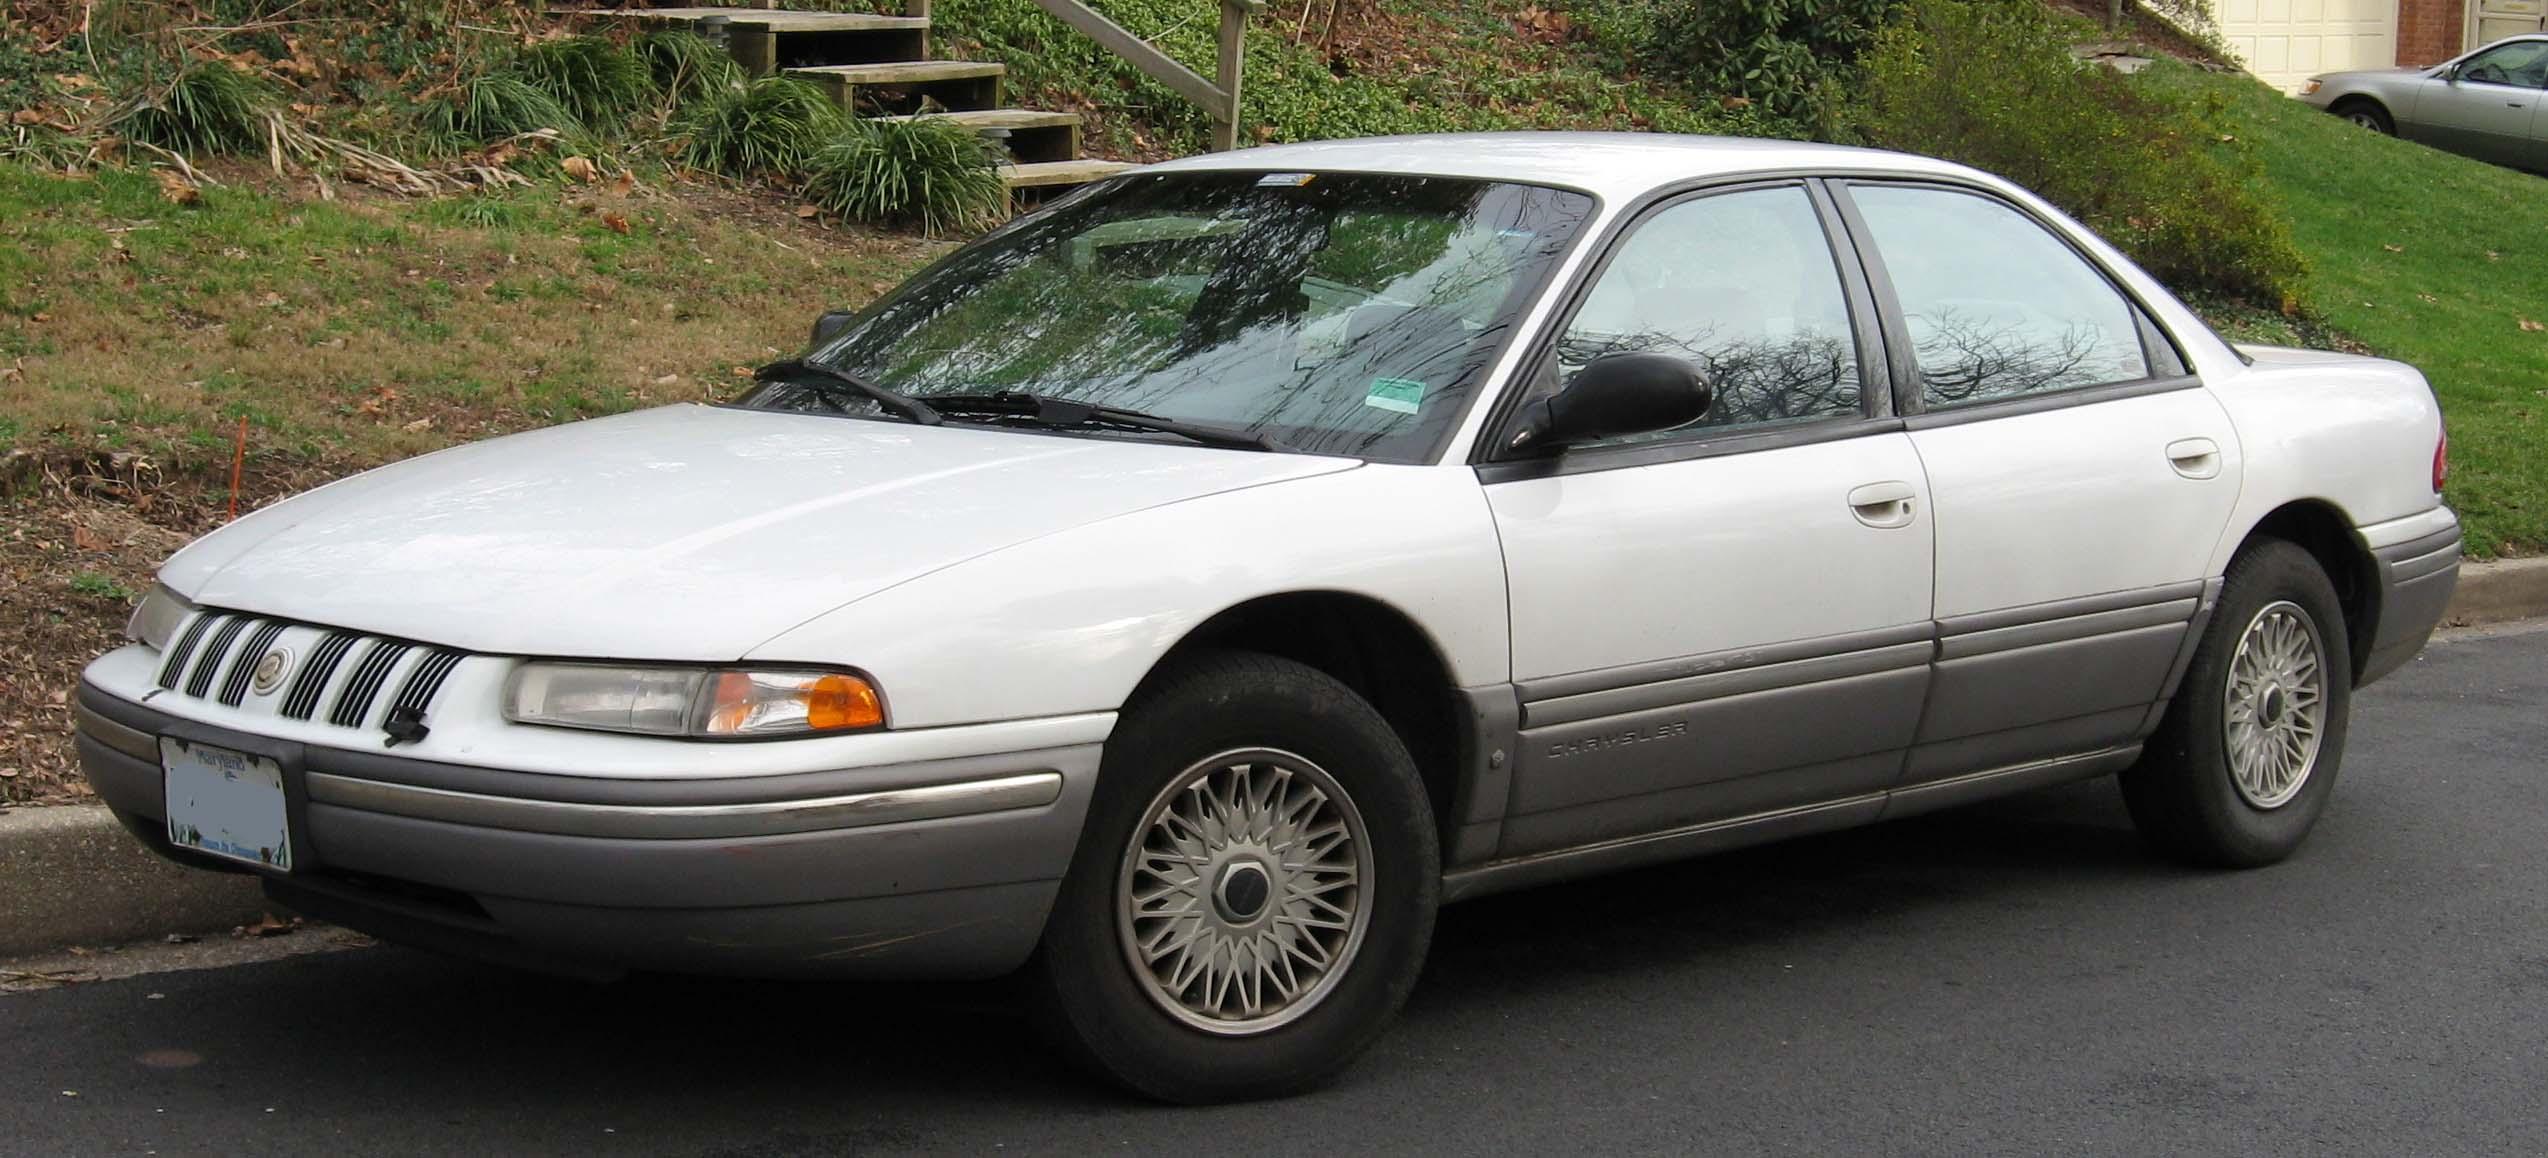 Chrysler Concorde I 1993 - 1997 Sedan #1